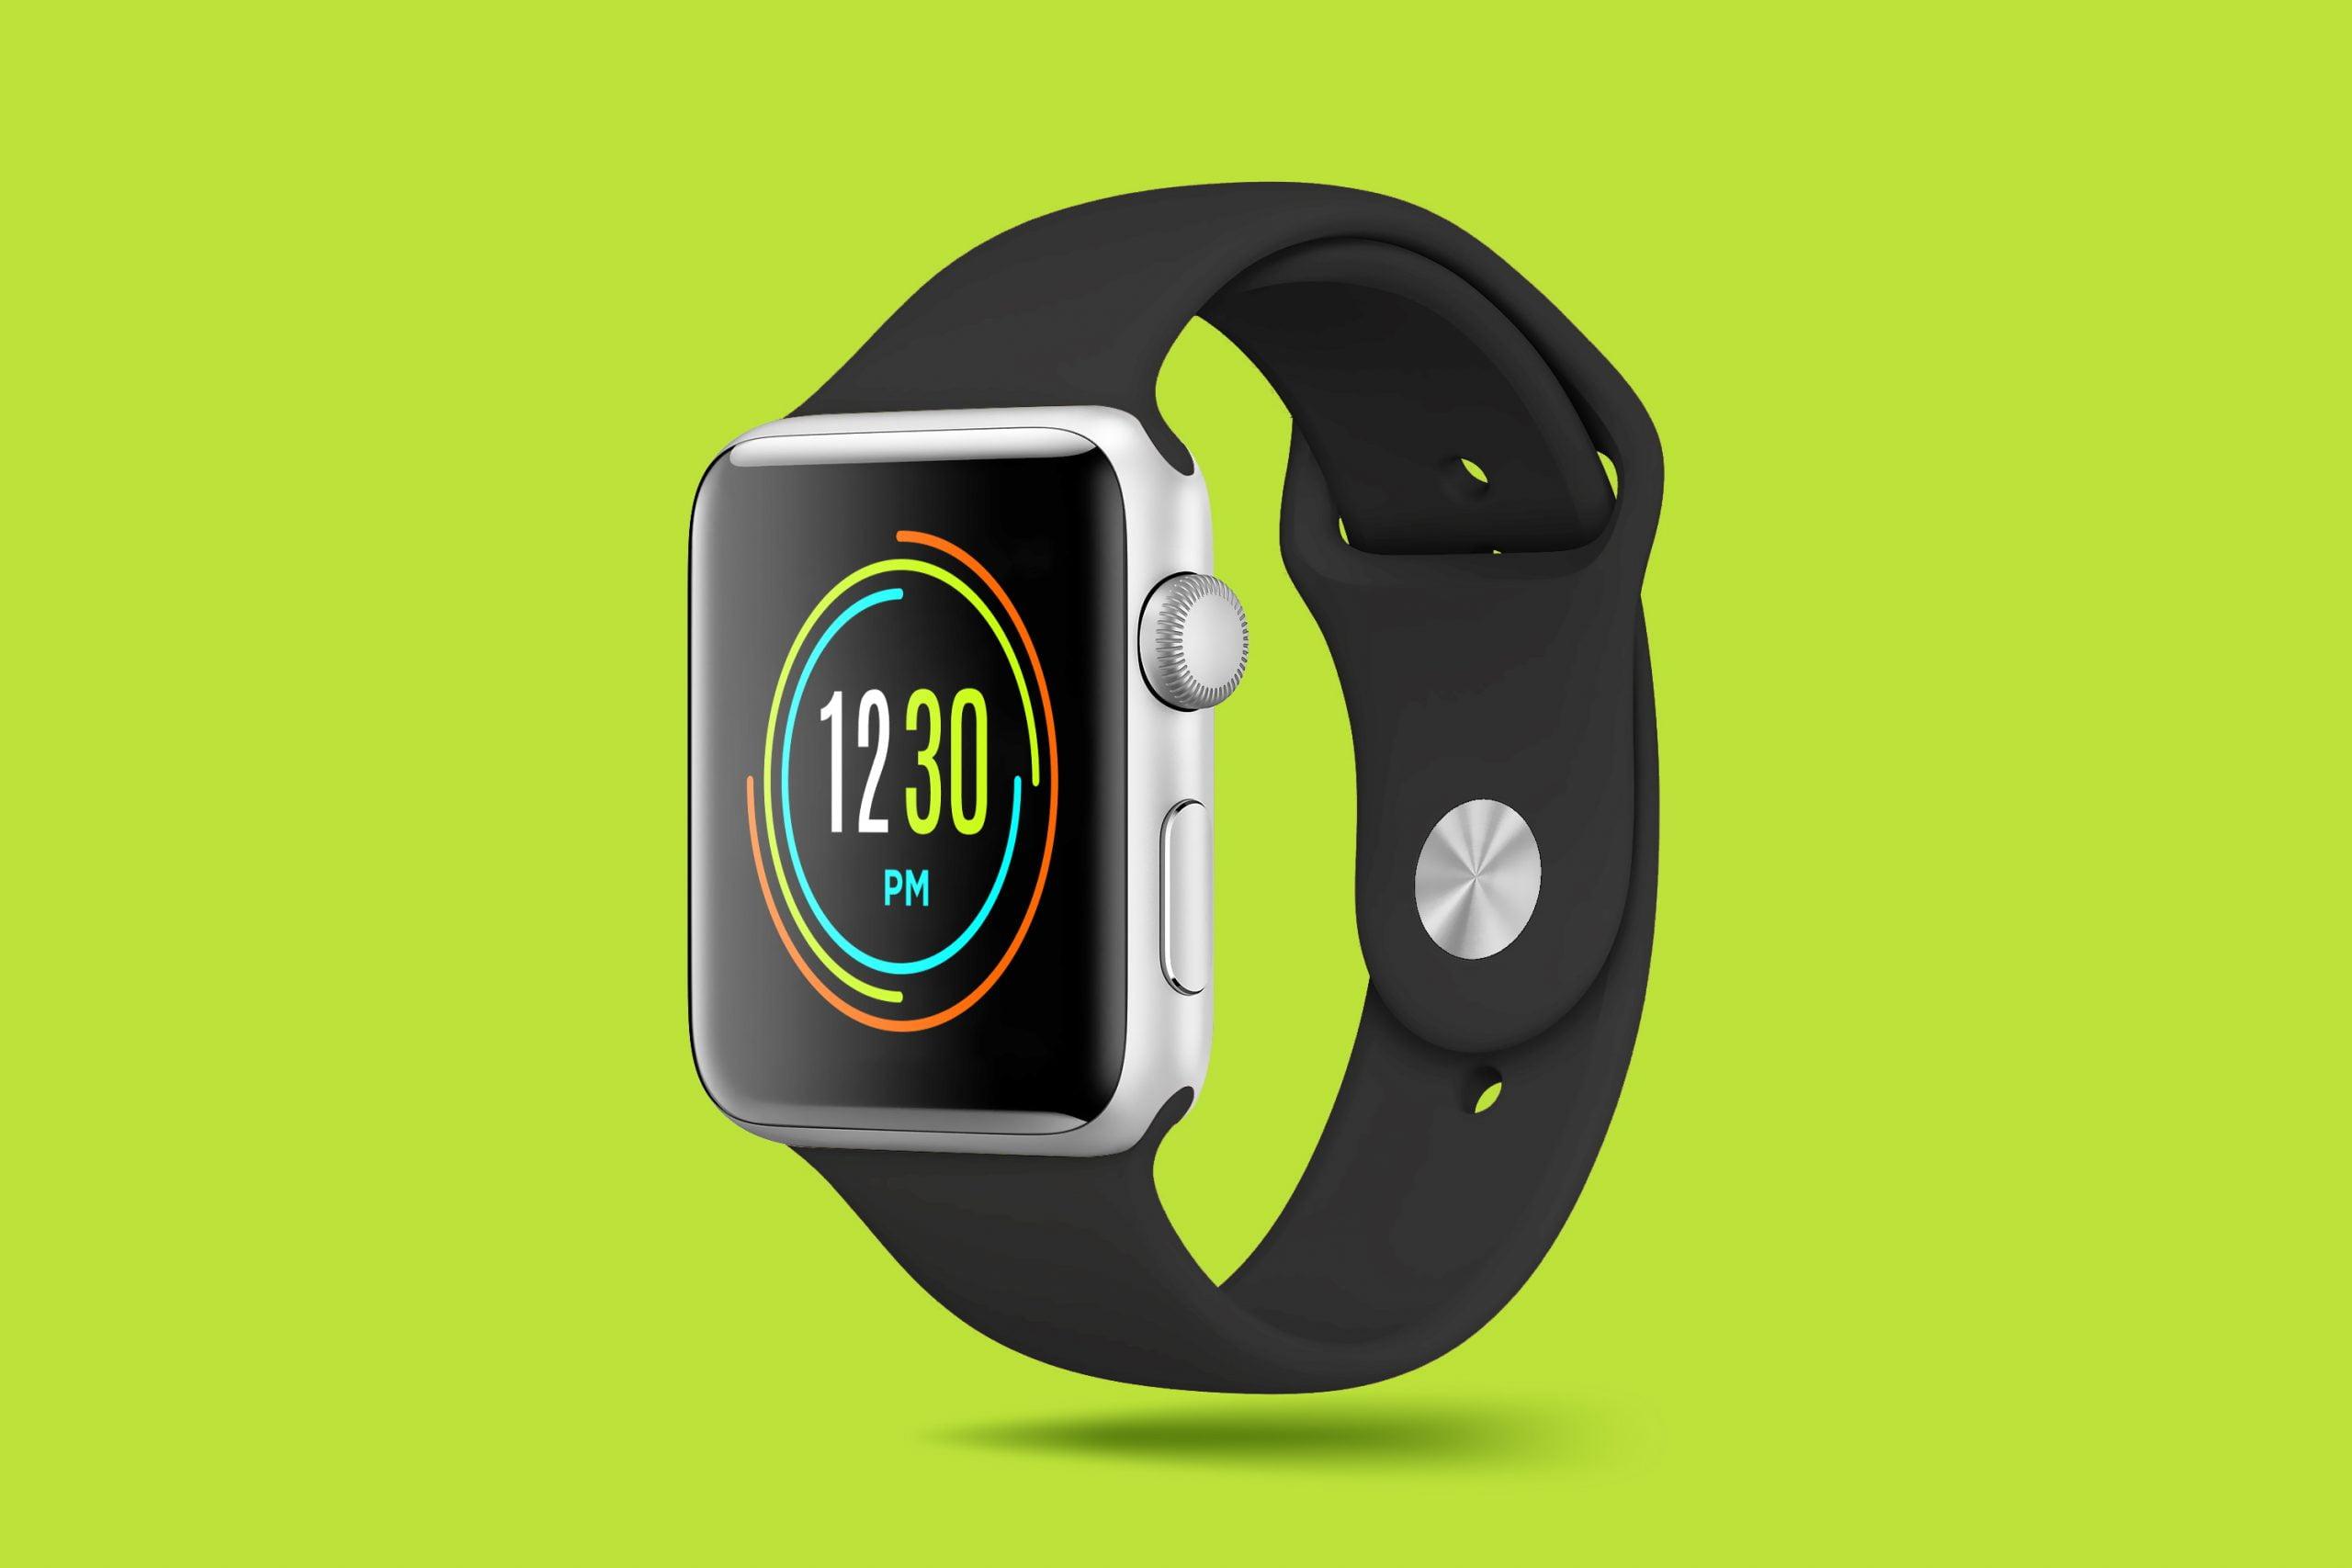 Smart Watch Mockup Design 5